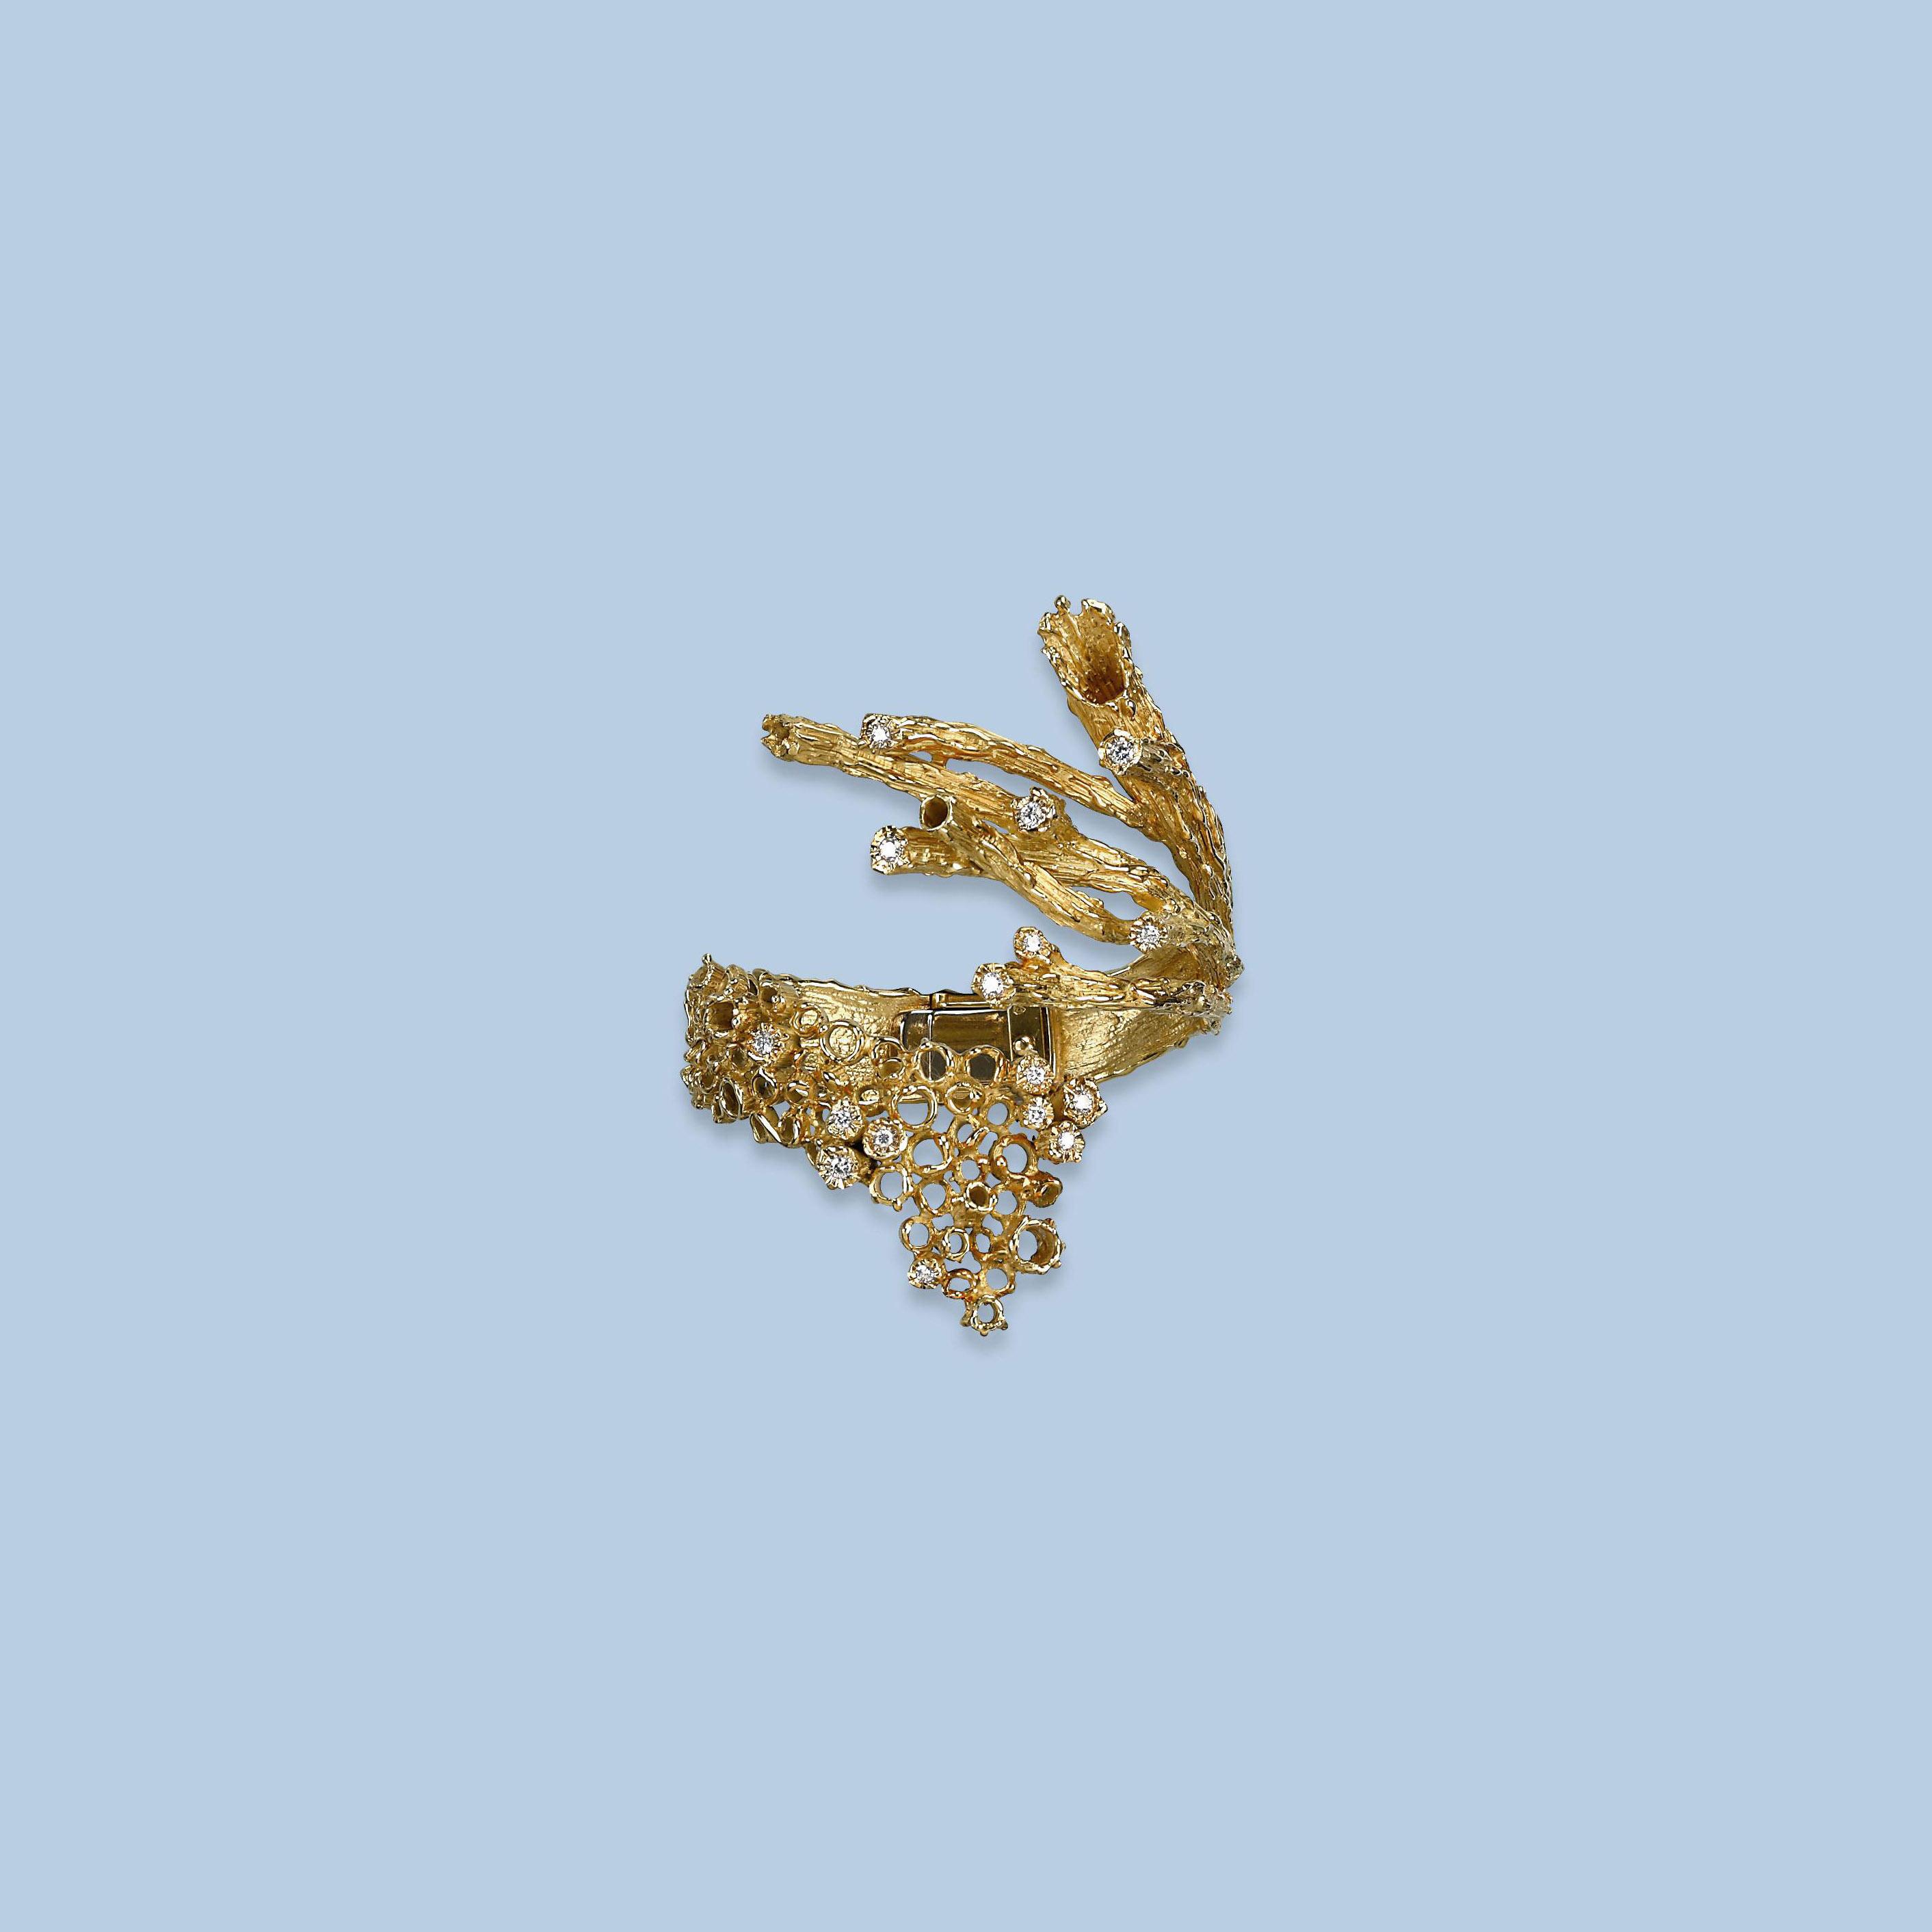 A CONTEMPORARY GOLD AND DIAMON